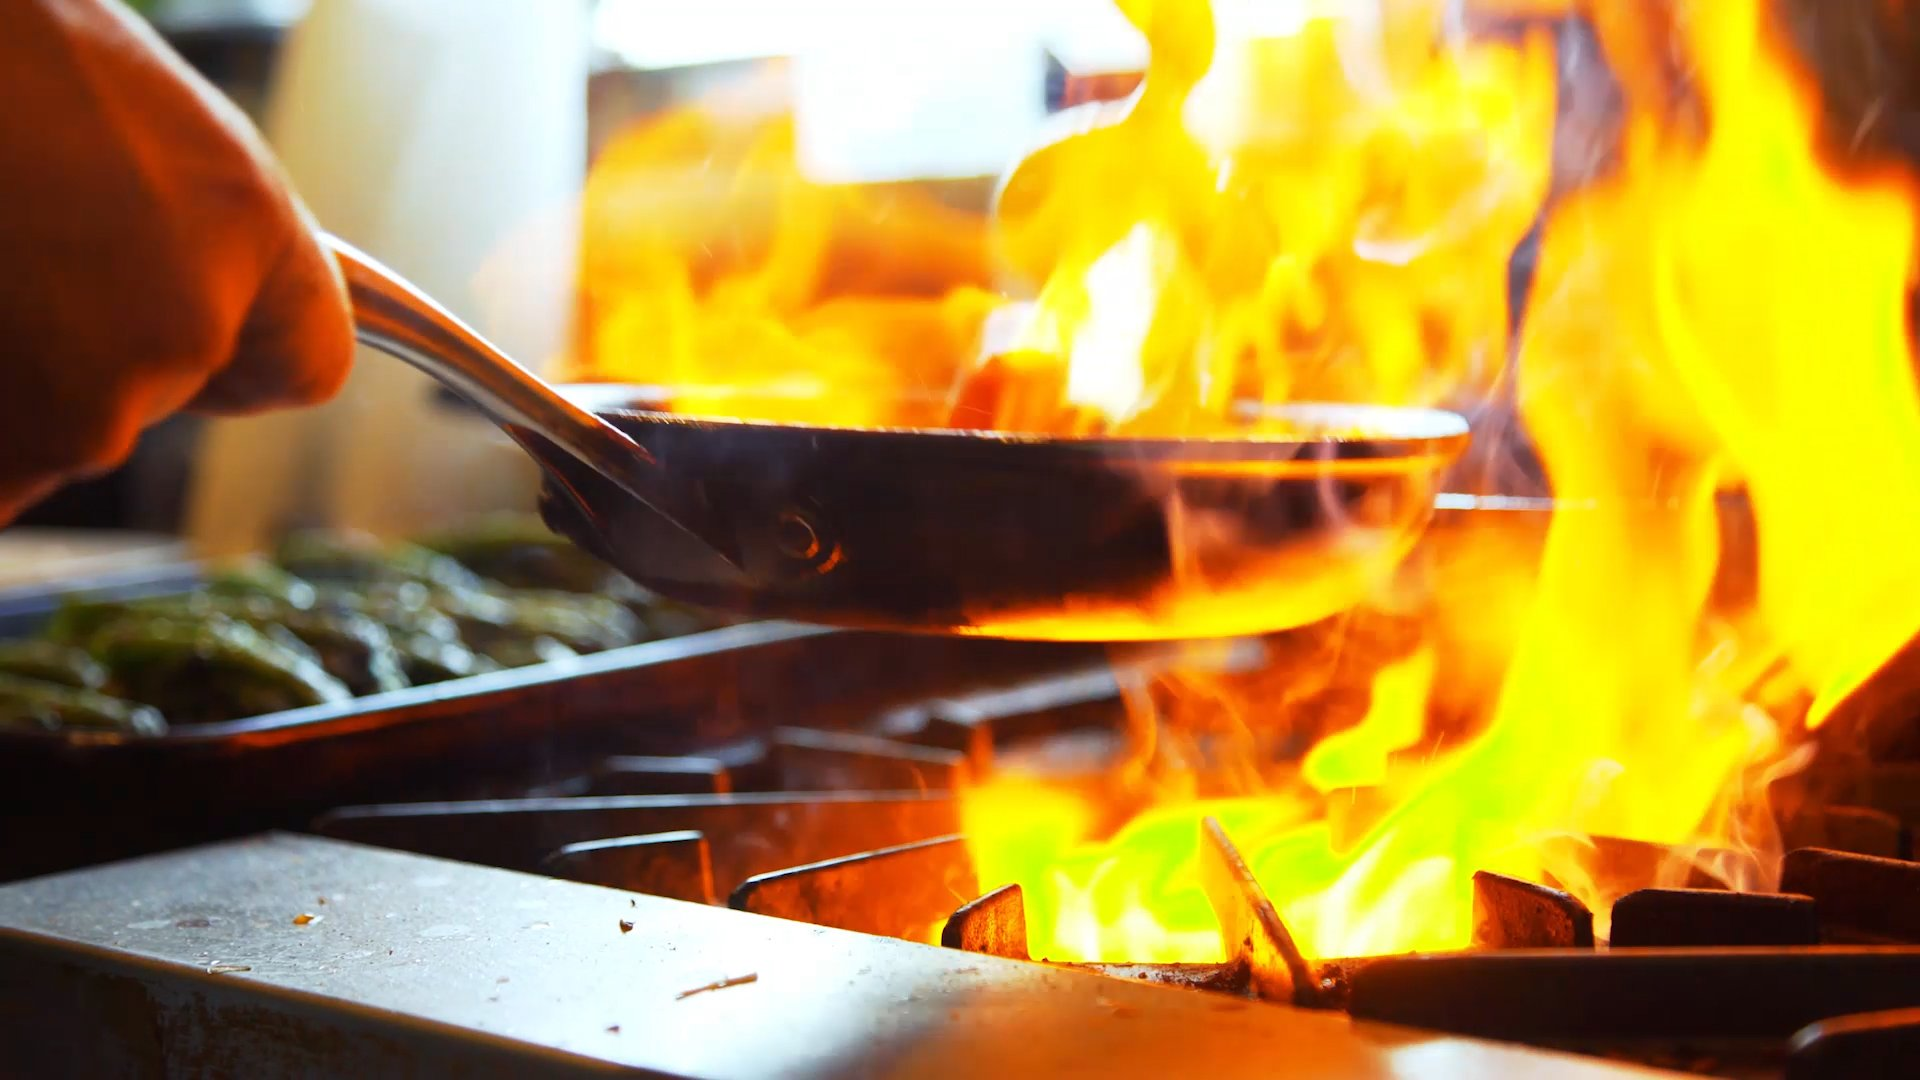 Where the Chef makes the magic happen